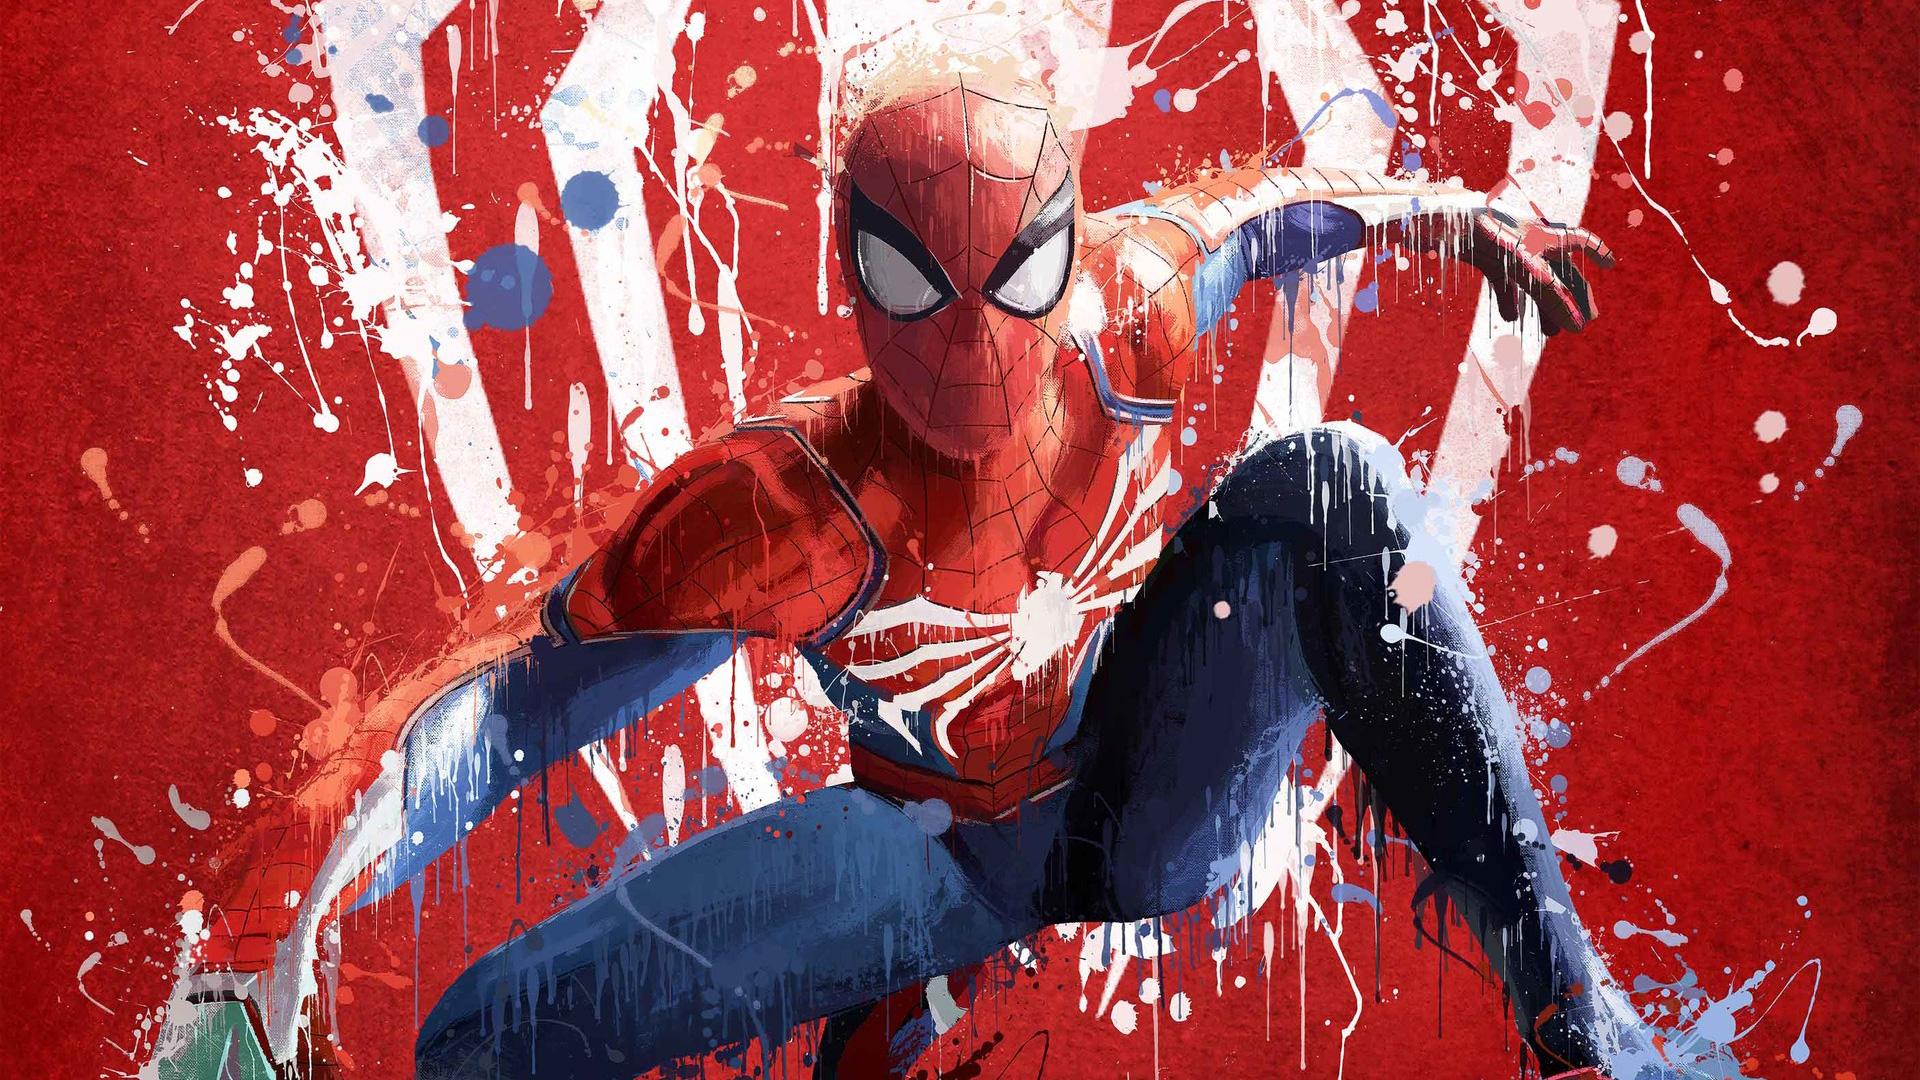 Wallpaper Spider Man 2099 Fan Art 4k Creative Graphics: Spiderman Ps4 Art 2018, HD Games, 4k Wallpapers, Images